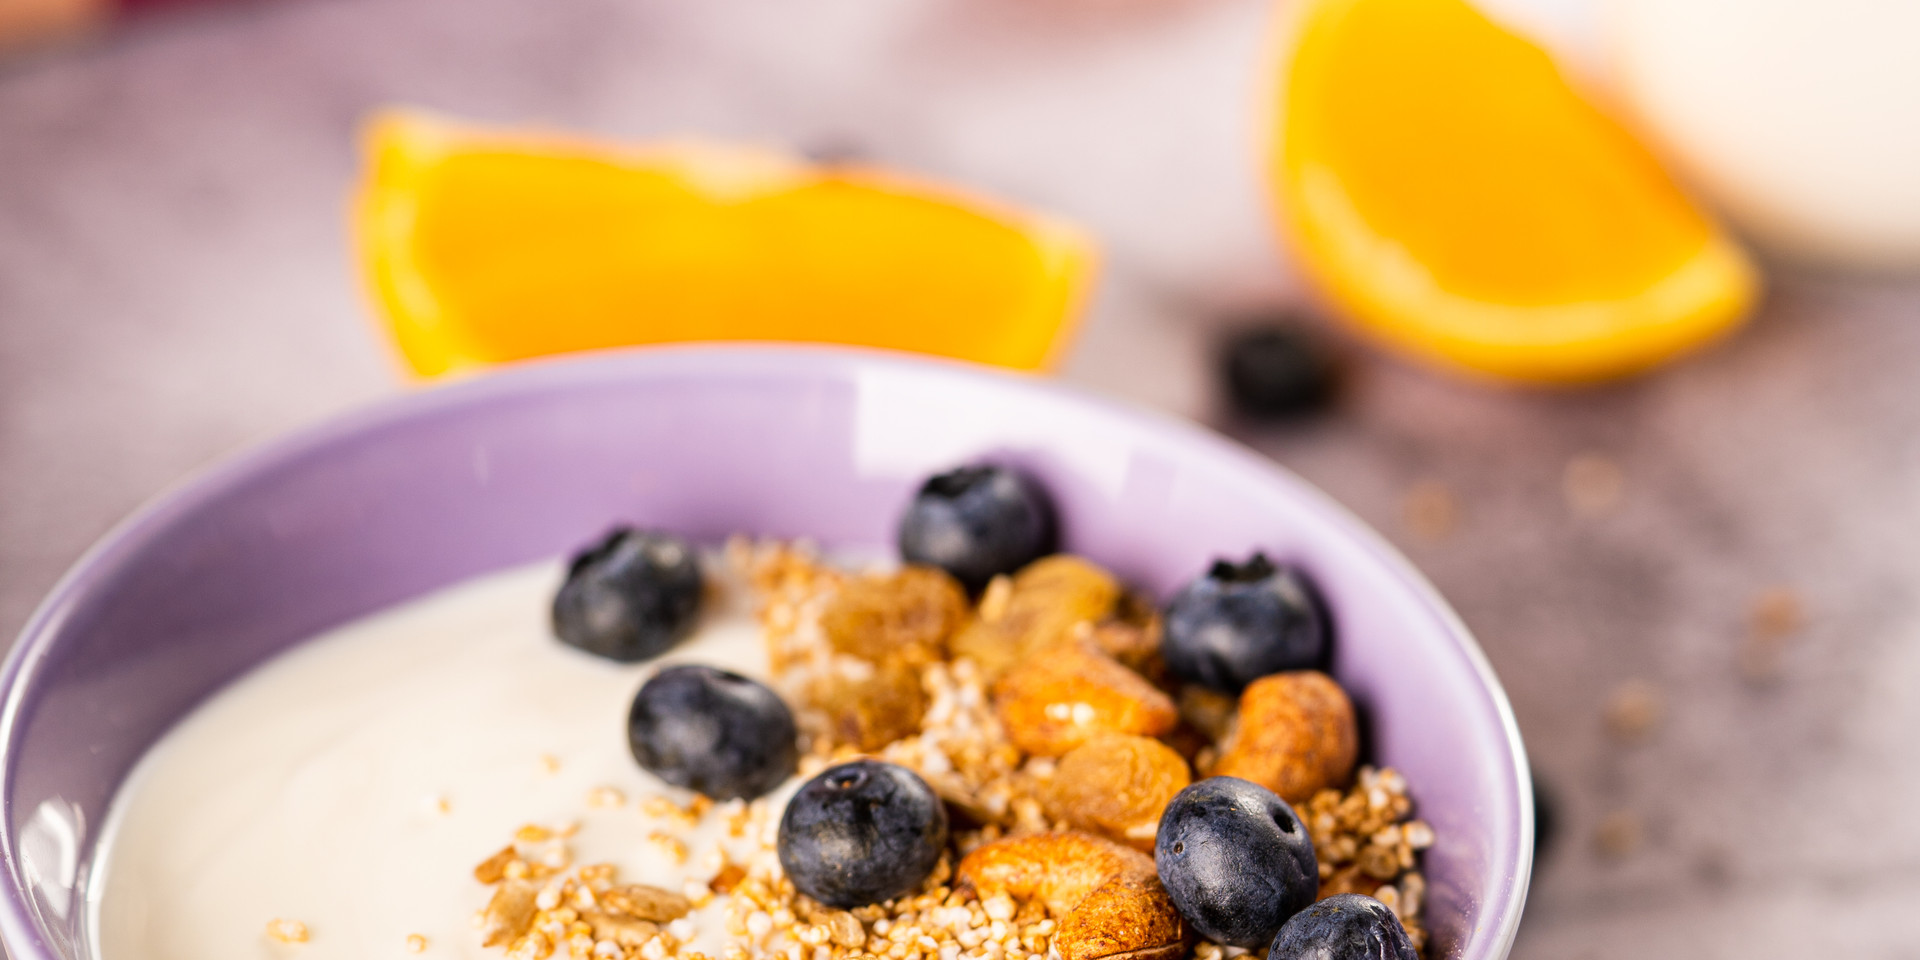 Health Bowl by Nourish Organics